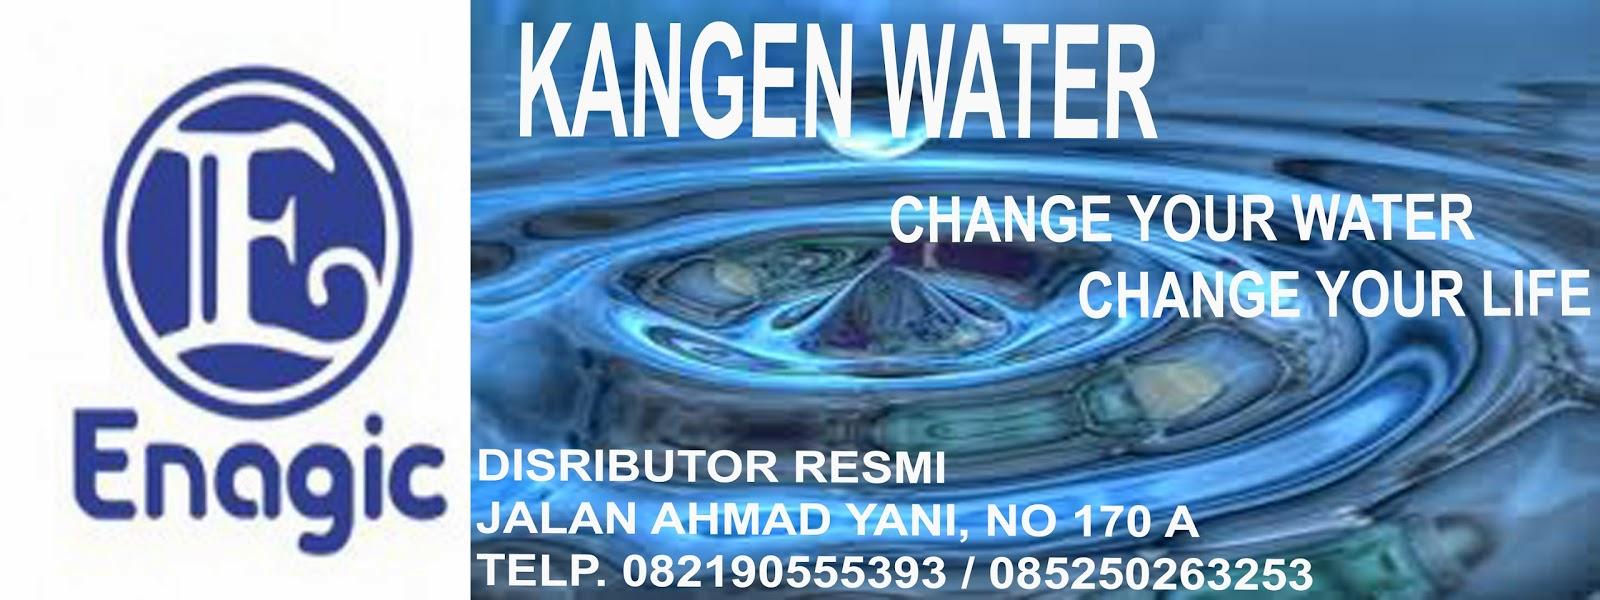 KANGEN+WATER+MUGNI.jpg